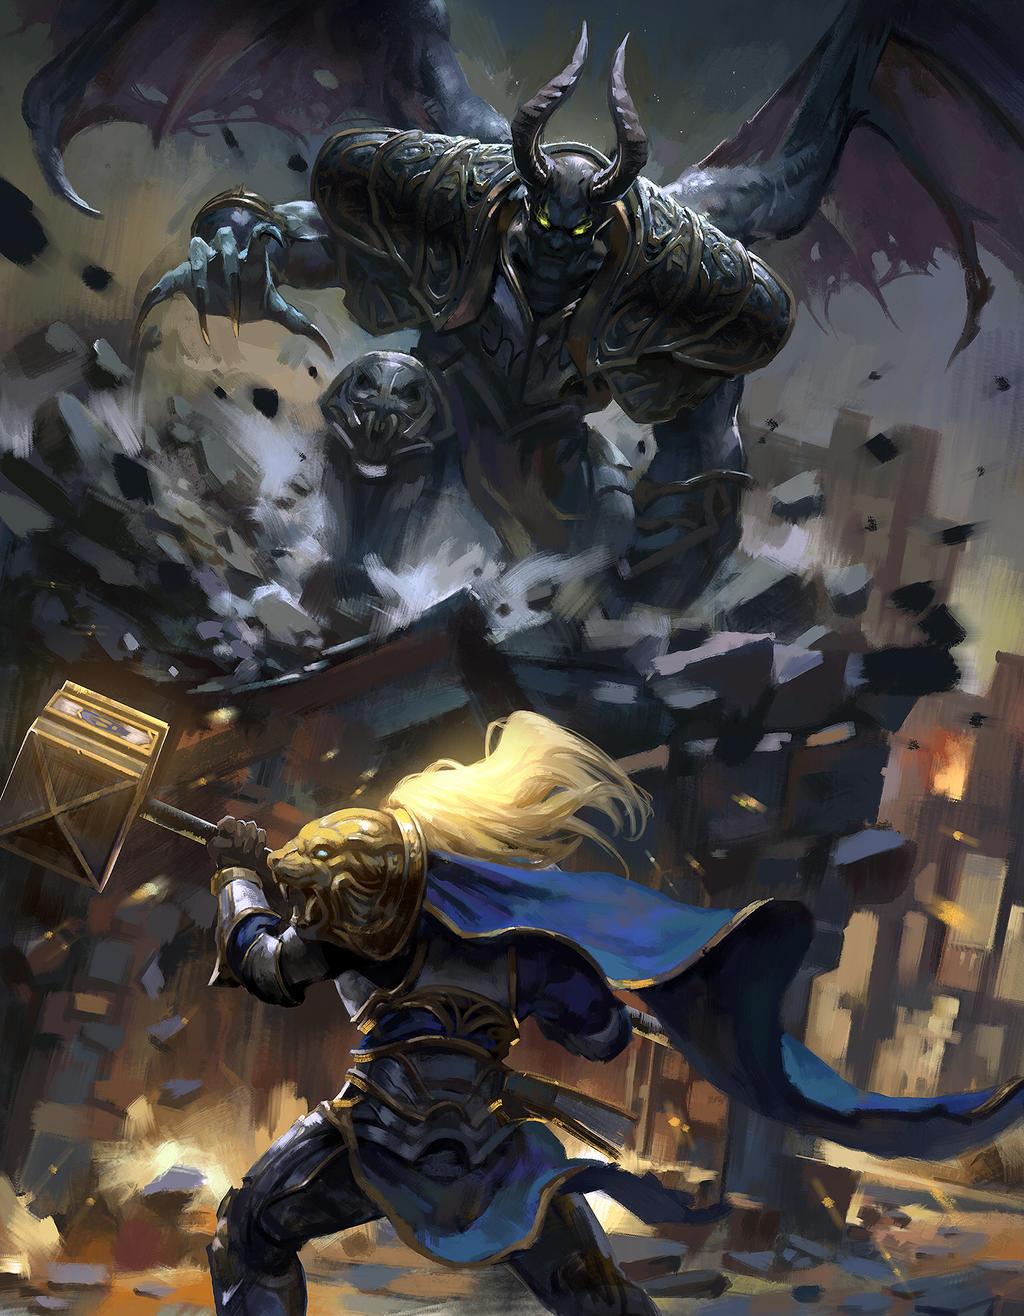 Prince Arthas VS Mal'ganis by zippo514 on DeviantArt